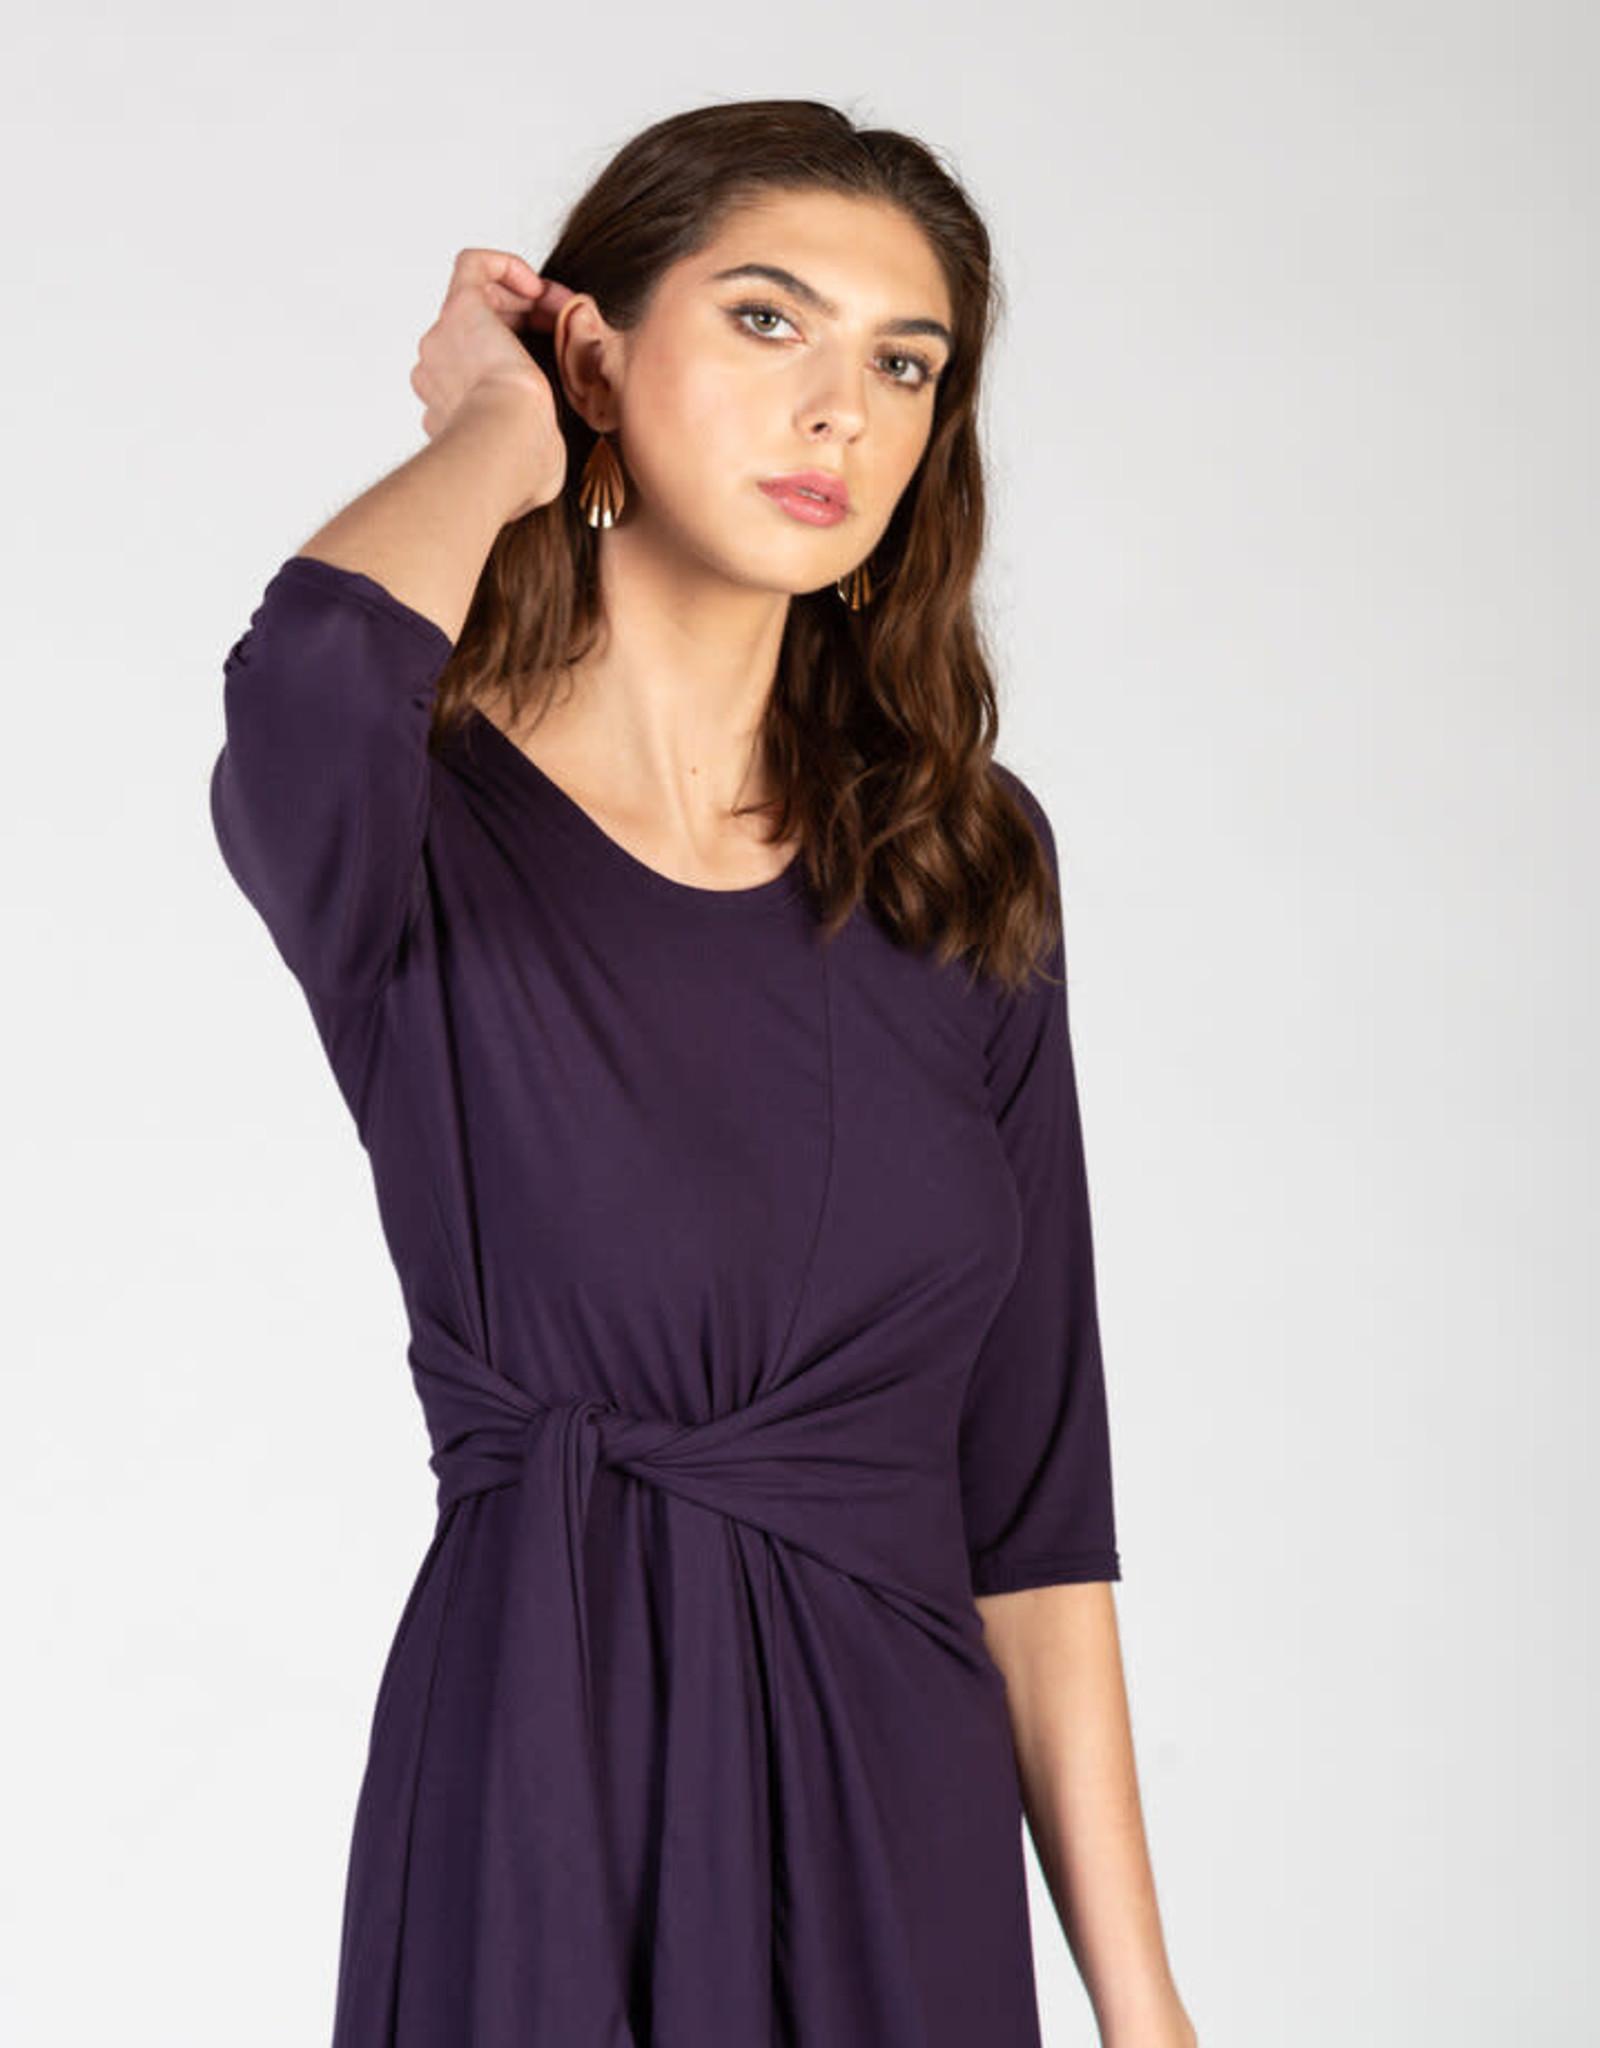 Whippoorwill Dress - Purple & Navy